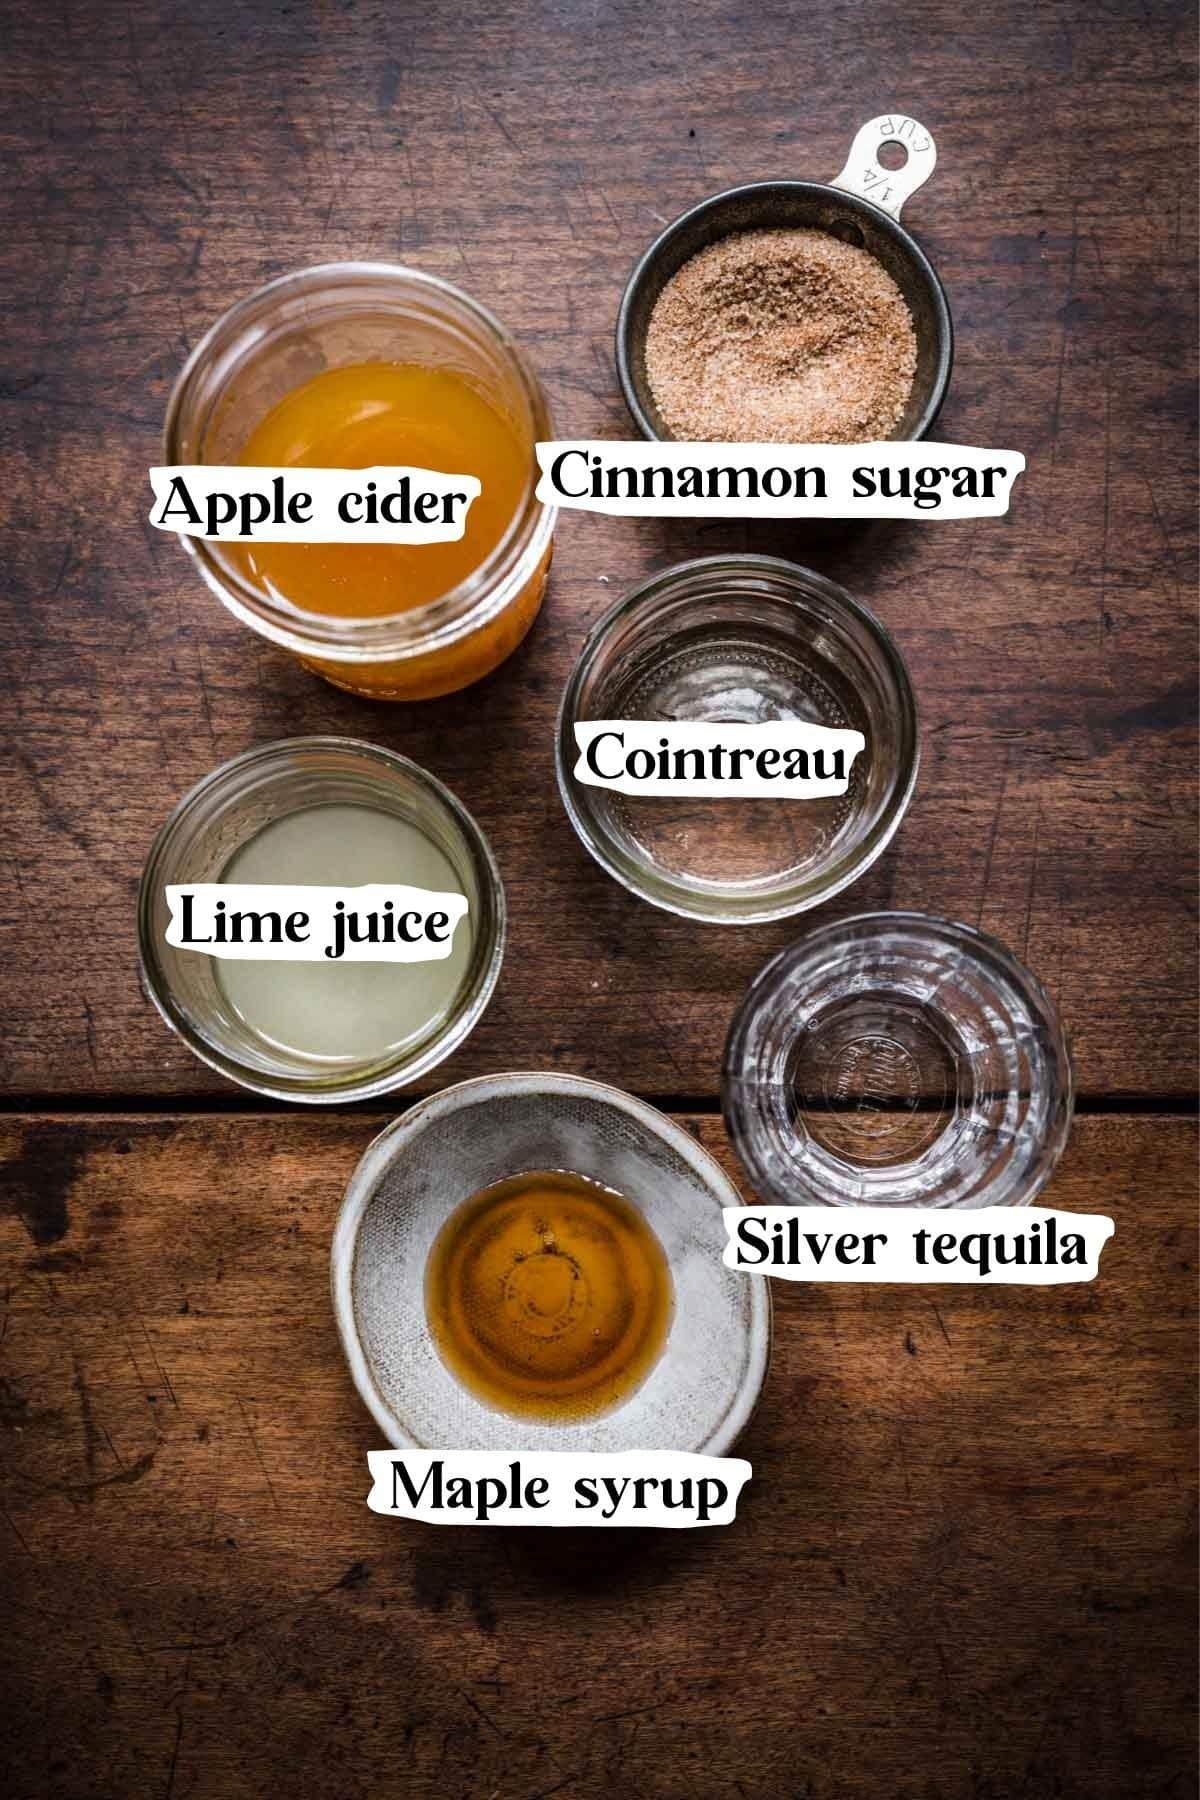 Overhead view of apple cider margarita ingredients.